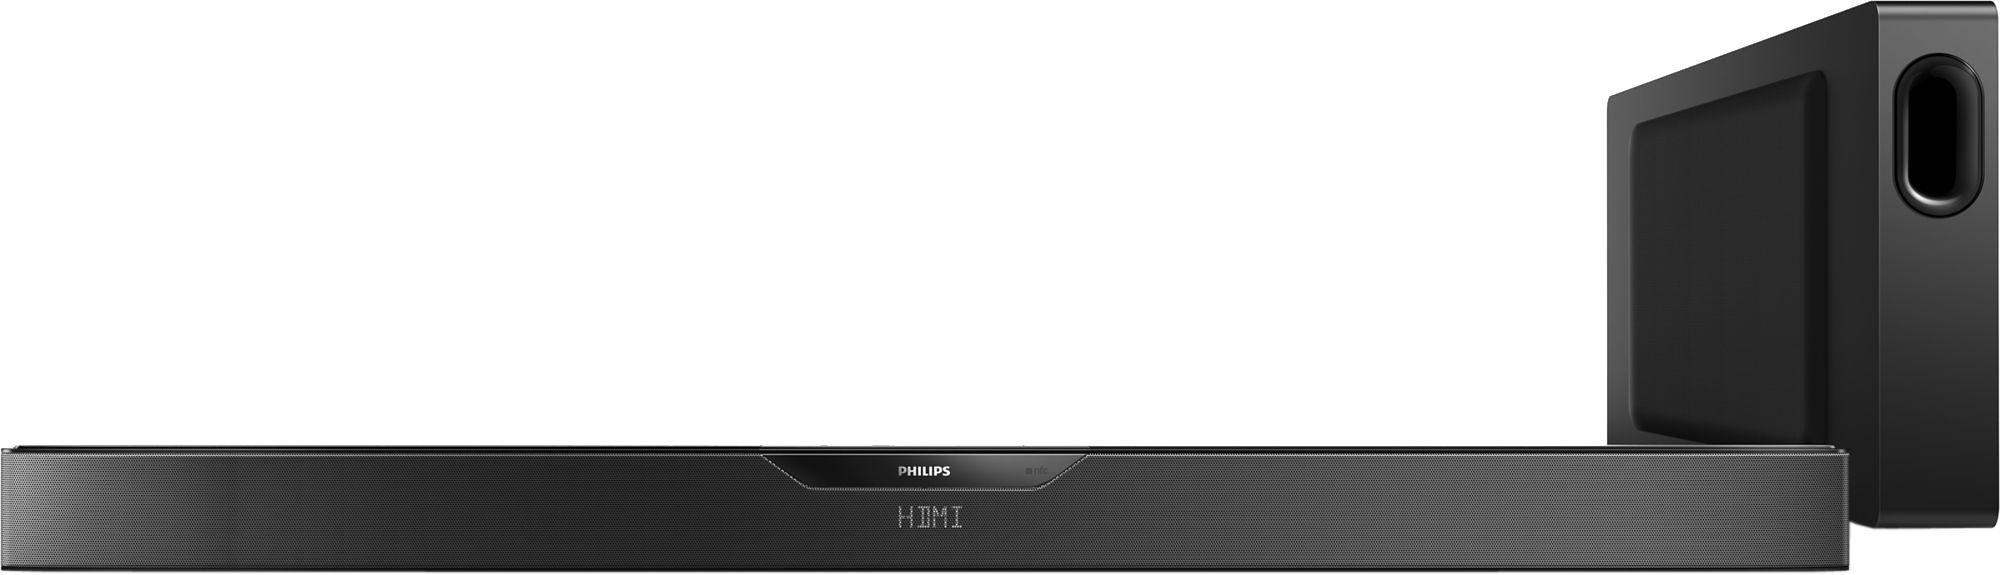 Philips HTL6145 Soundbar (Bluetooth, NFC)